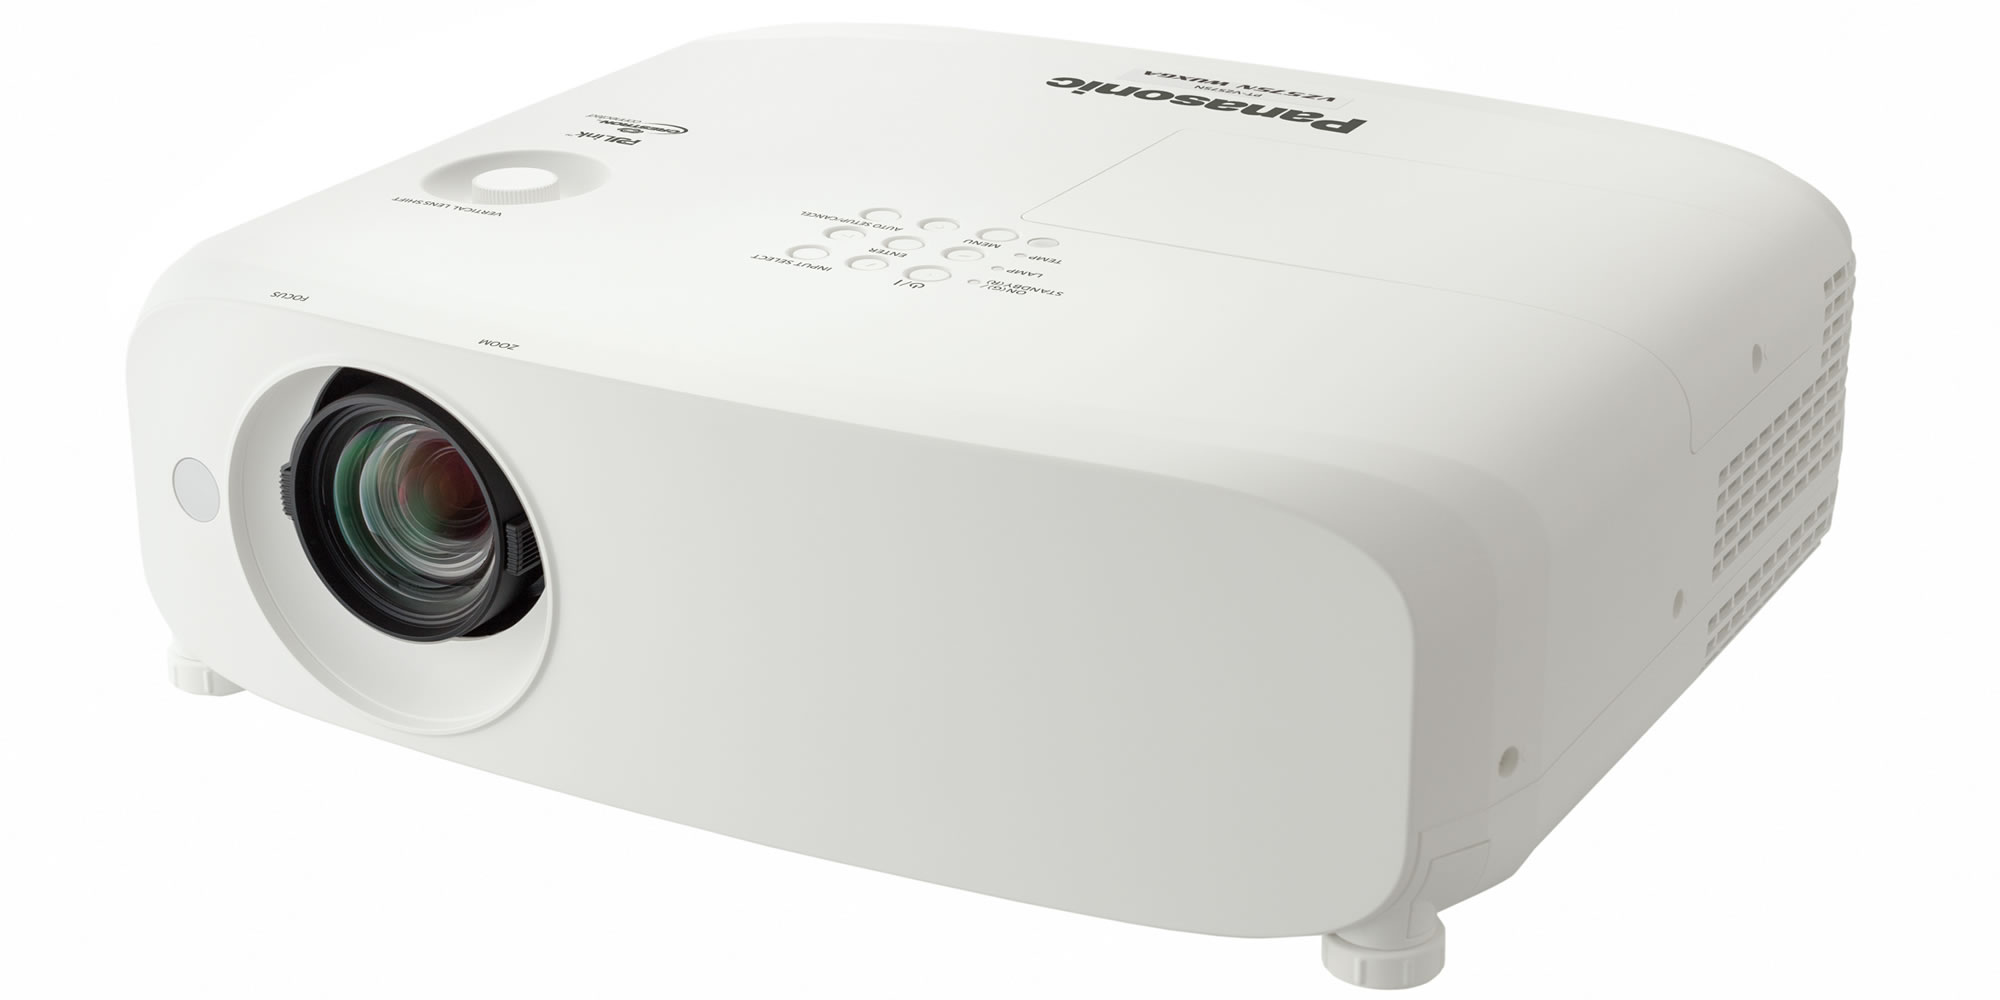 Проектор Panasonic PT-VW540E White 3P-Si LCD / 1280 х 800 / 16:10 / 5500 Lm / 16000:1 проектор panasonic pt ex620e lcdx3 1024x768 6200 ansi lm